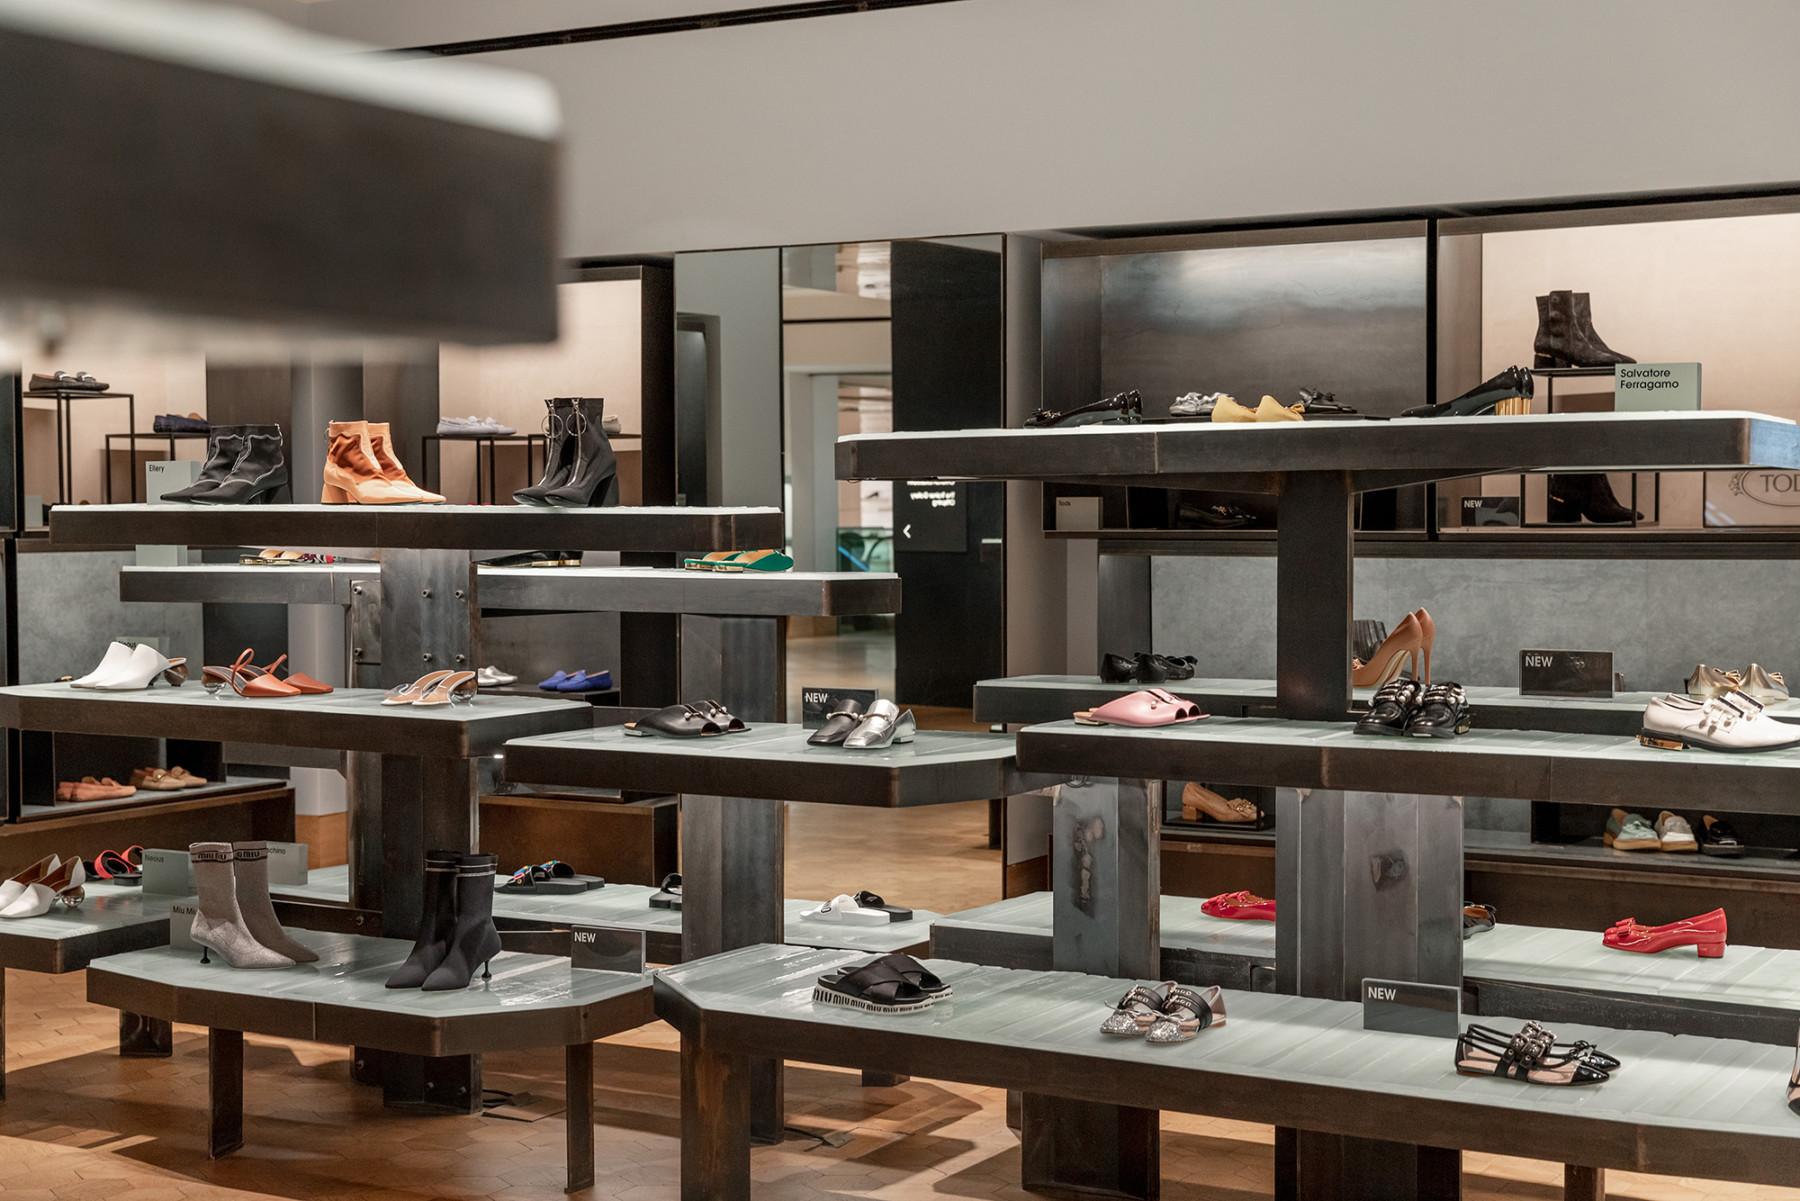 jamie-fobert-architects-selfridges-shoe-galleries-luxury-retail-concept-gallery-design-olivier-hess-photos-(1)